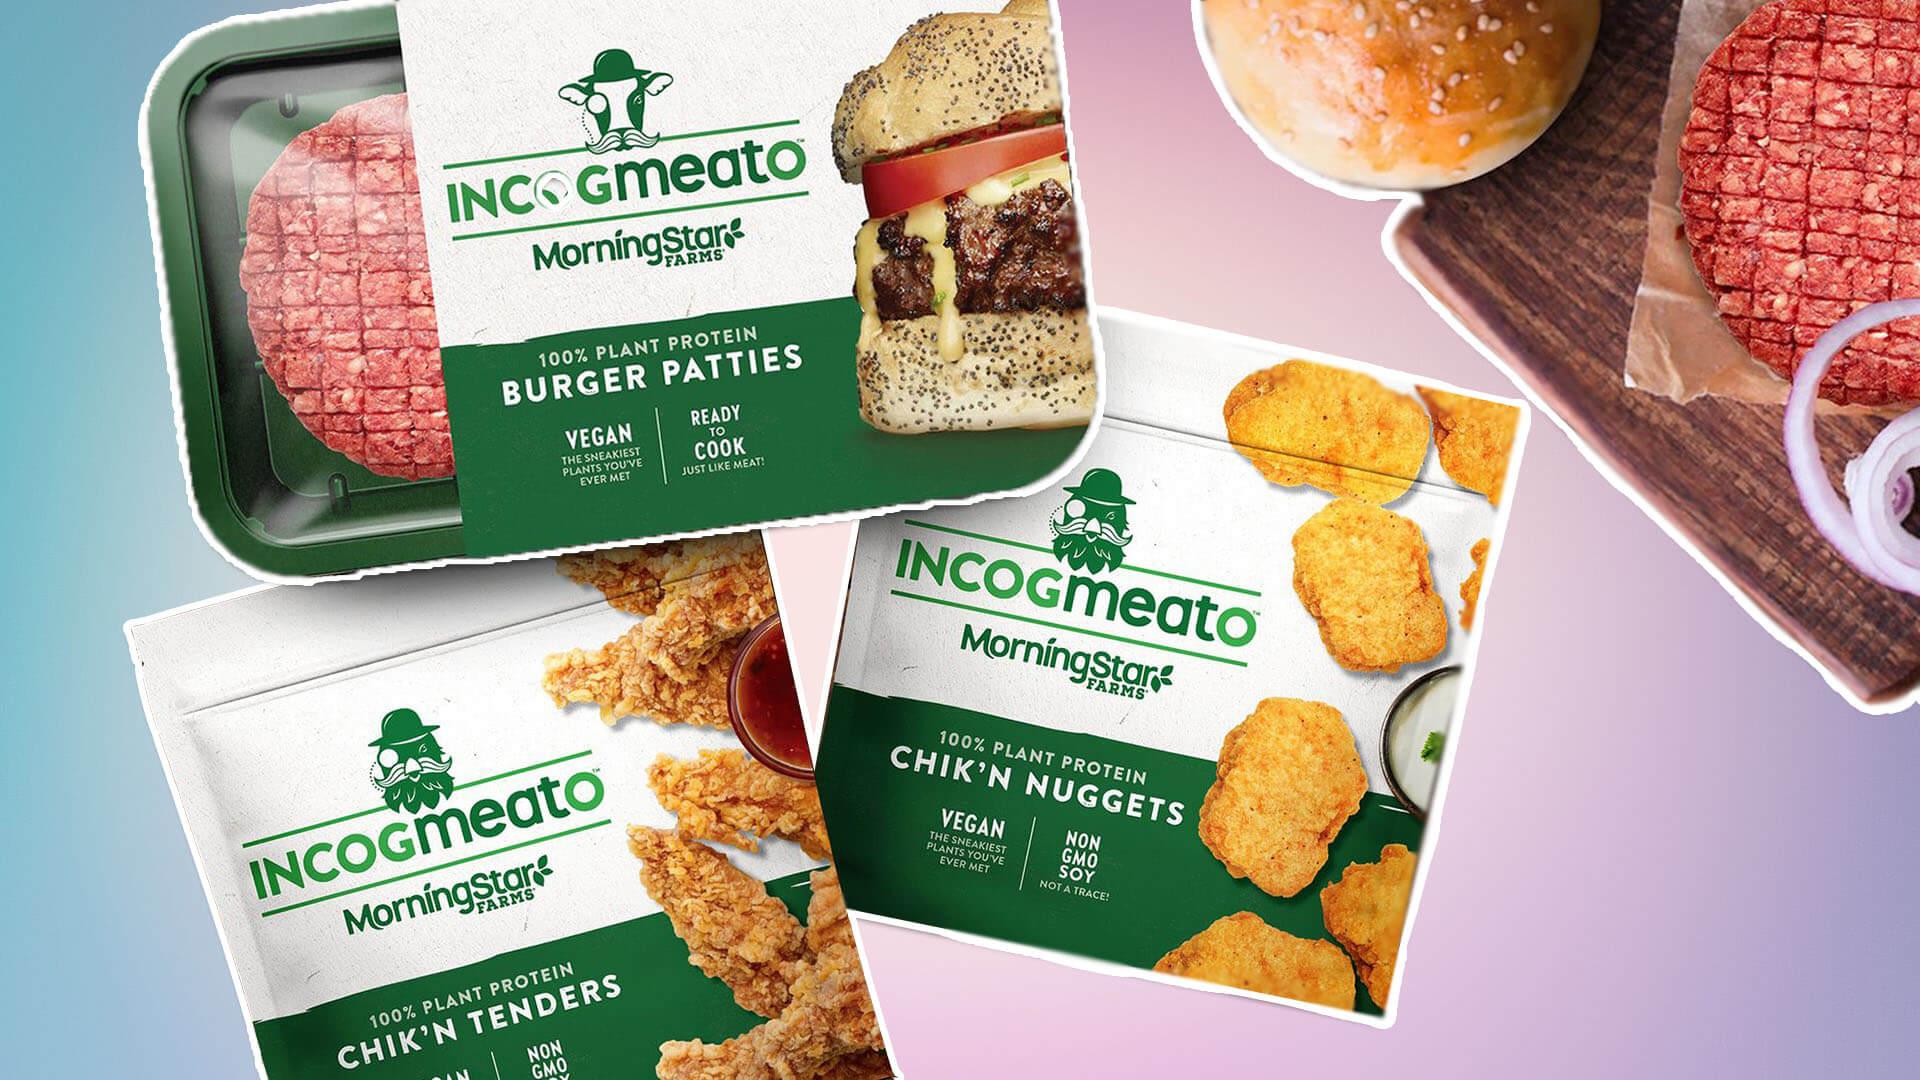 Morningstar Farms Launches 'Incogmeato' Vegan Meat Range